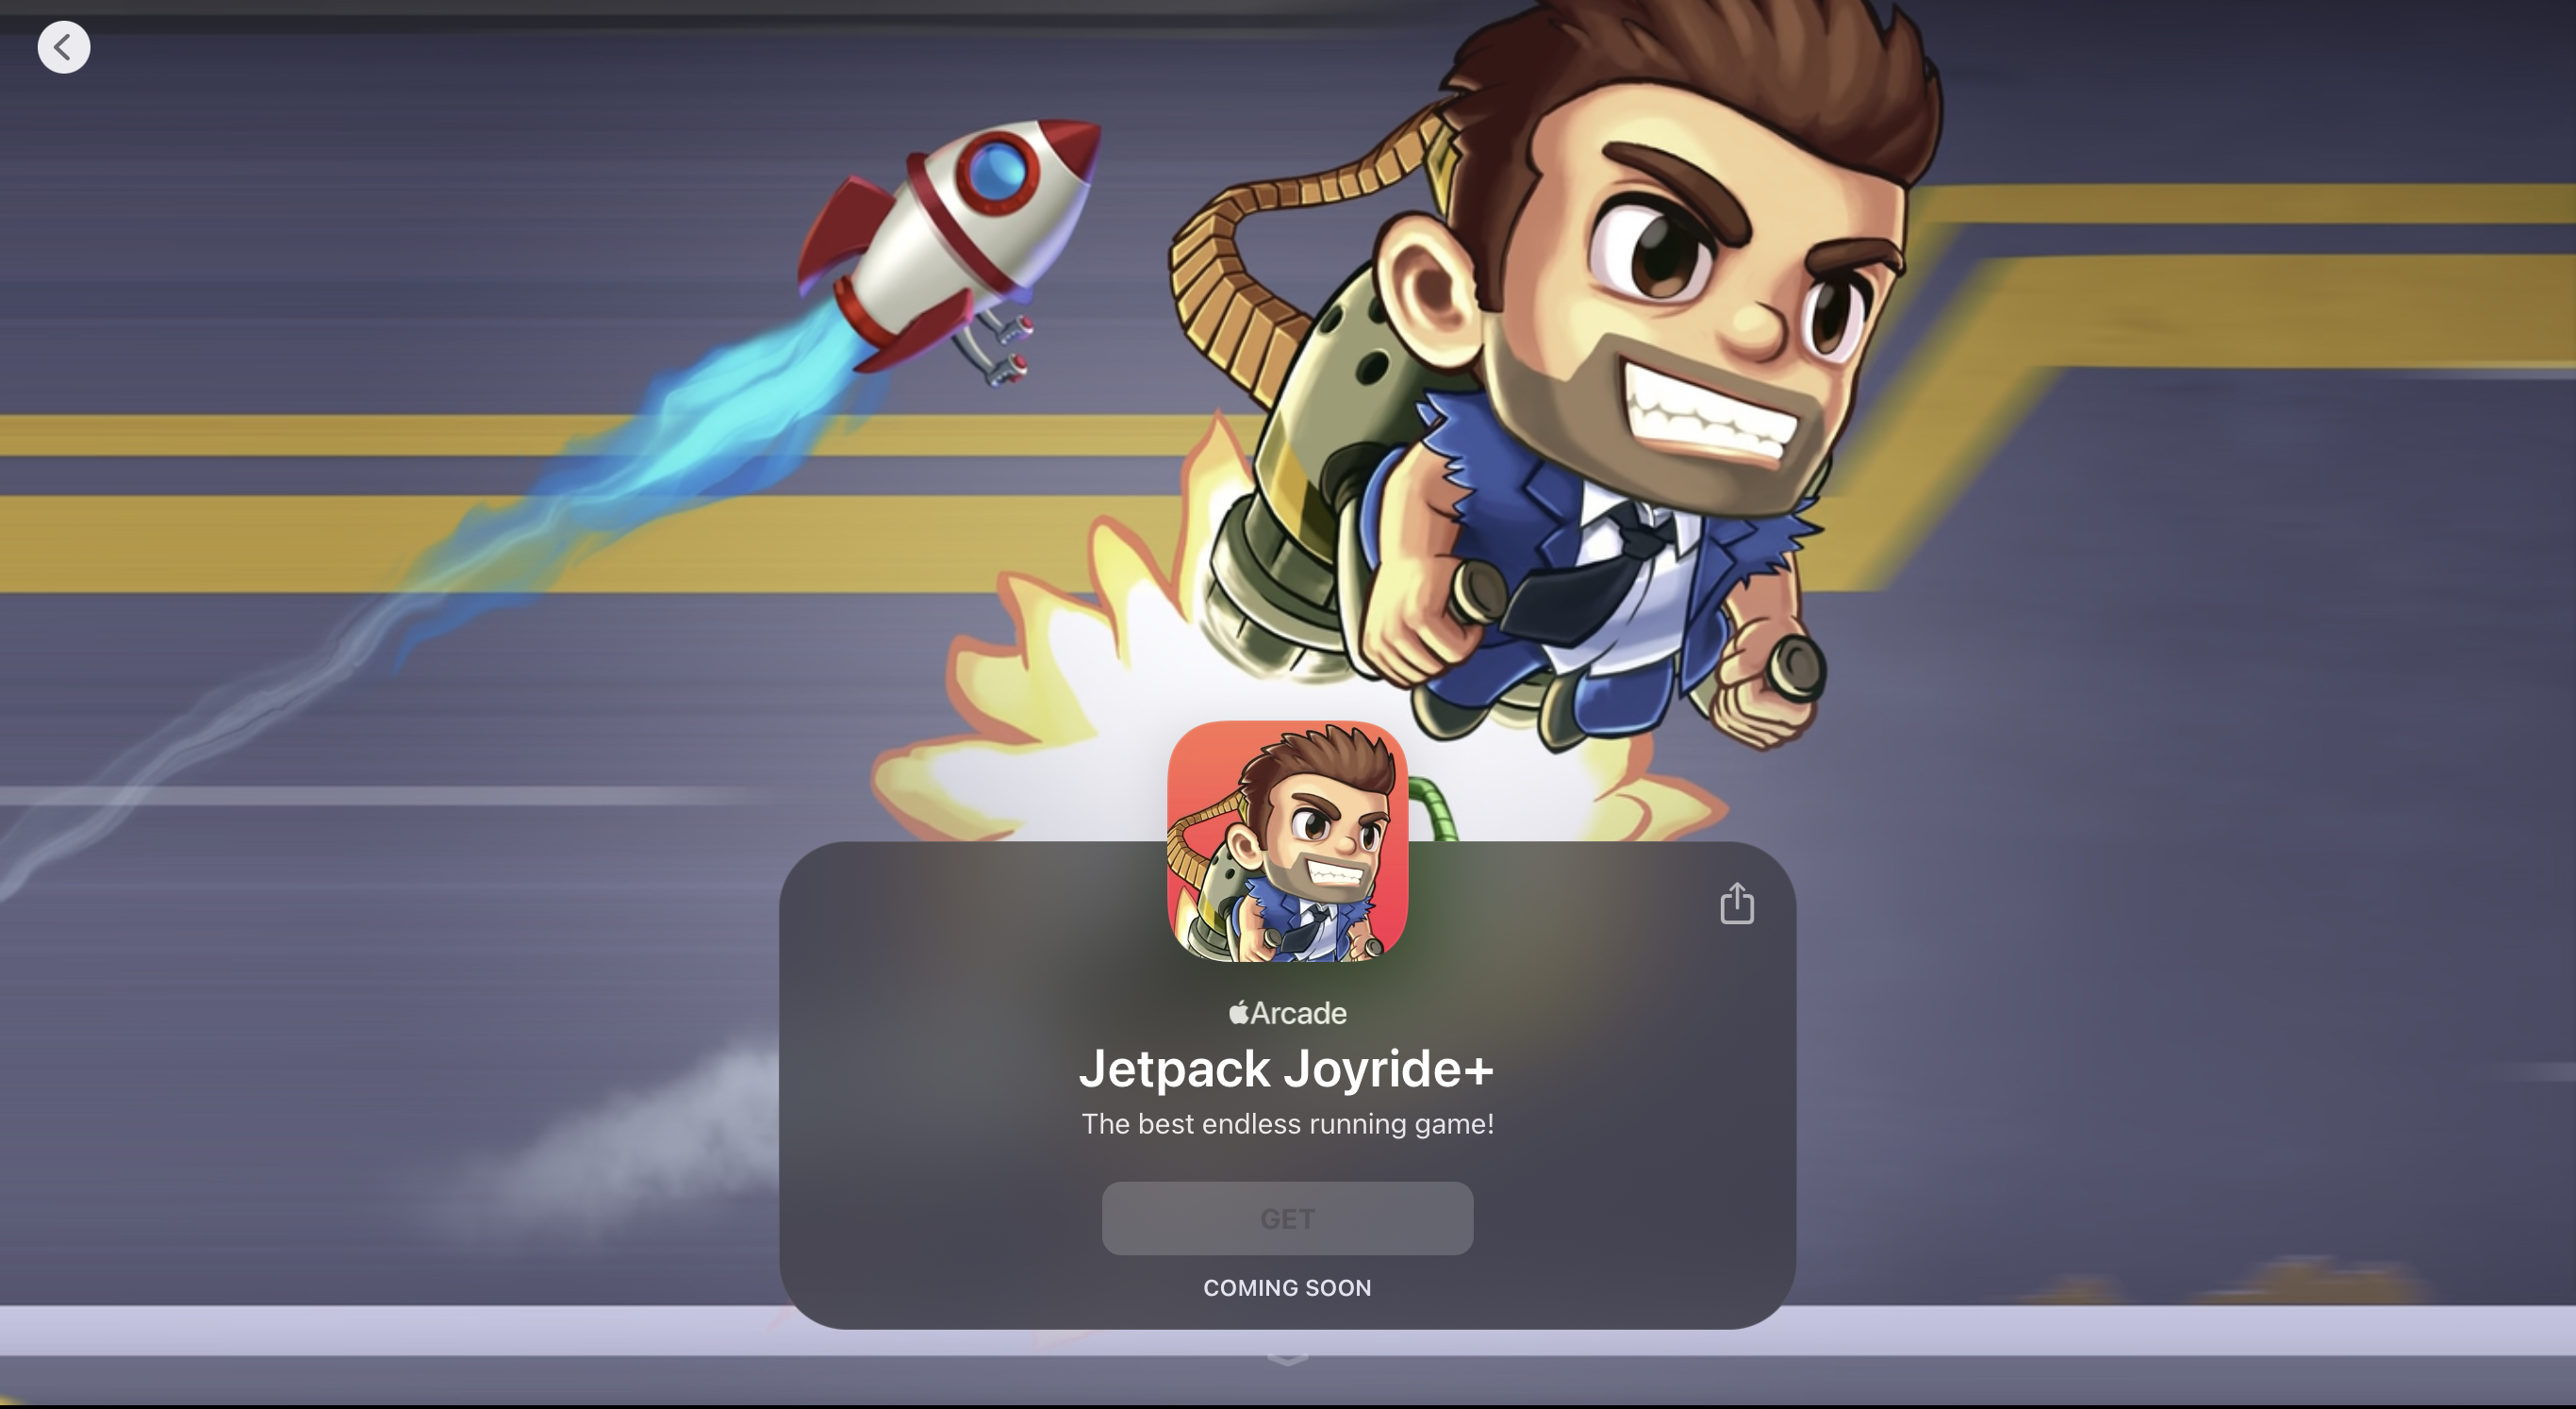 apple arcade jetpack joyride